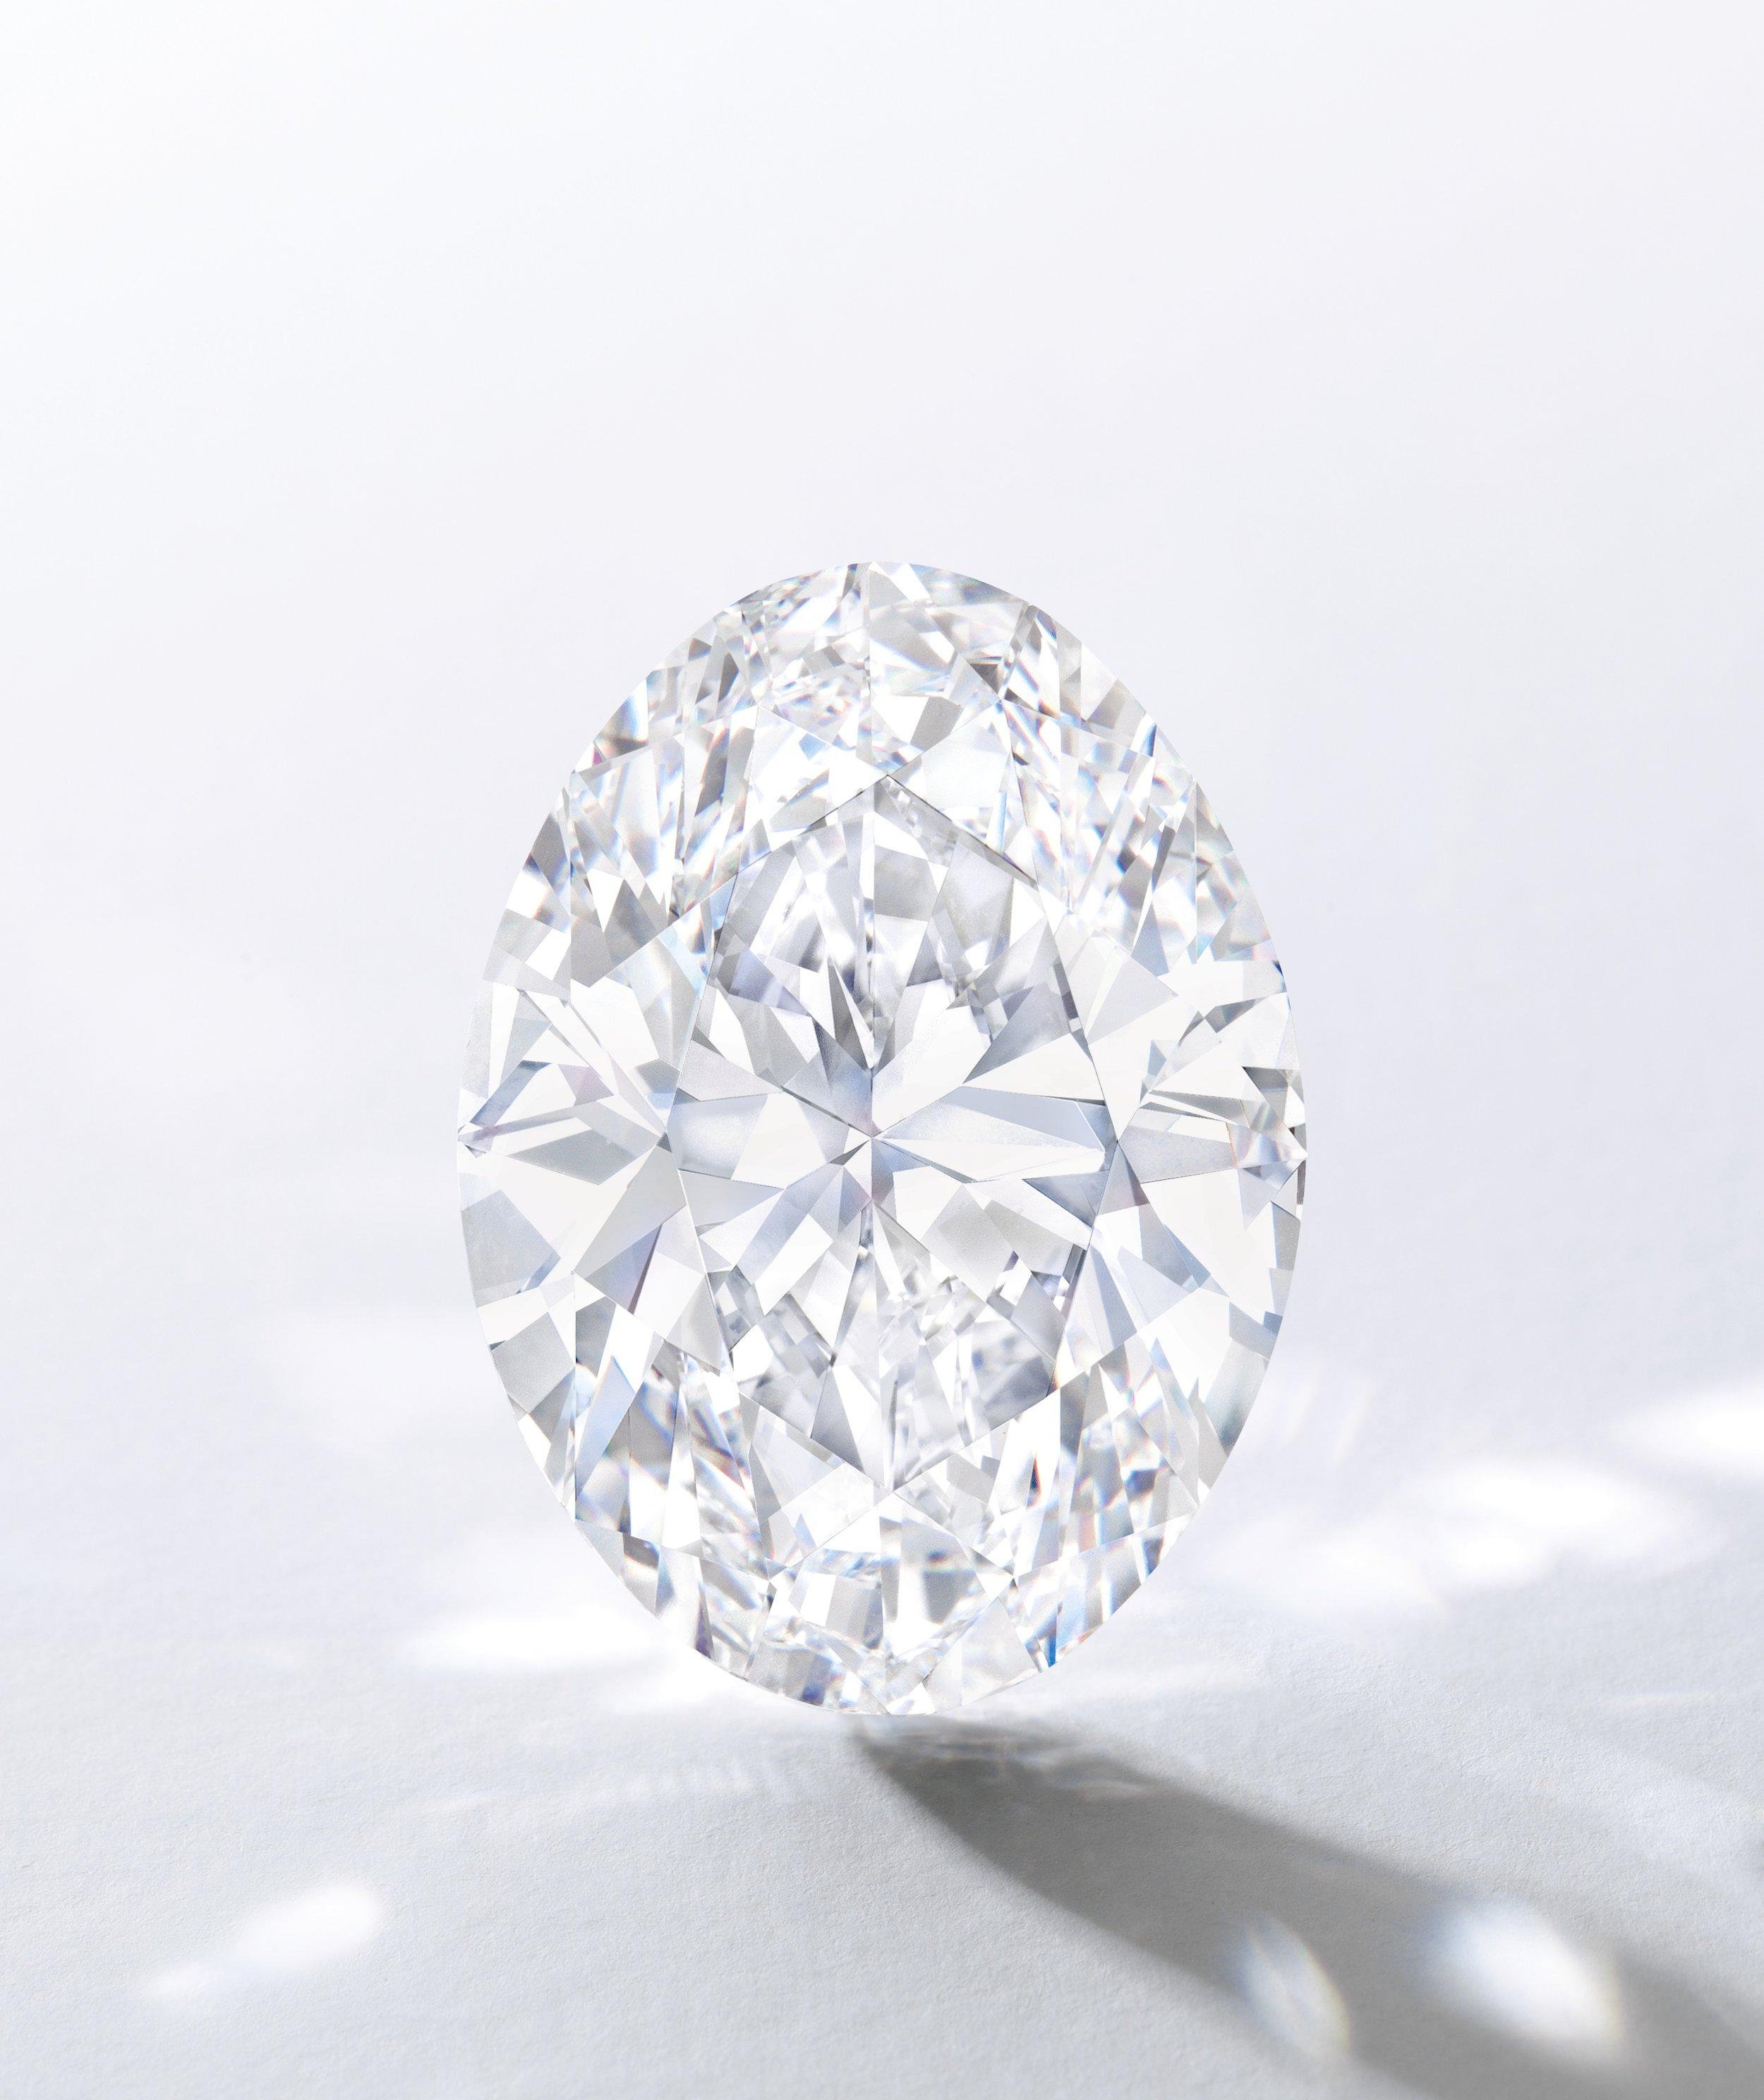 Sotheby's_The_Spectacular_88.22-Carat_Oval_Diamond_028HK0863.jpg